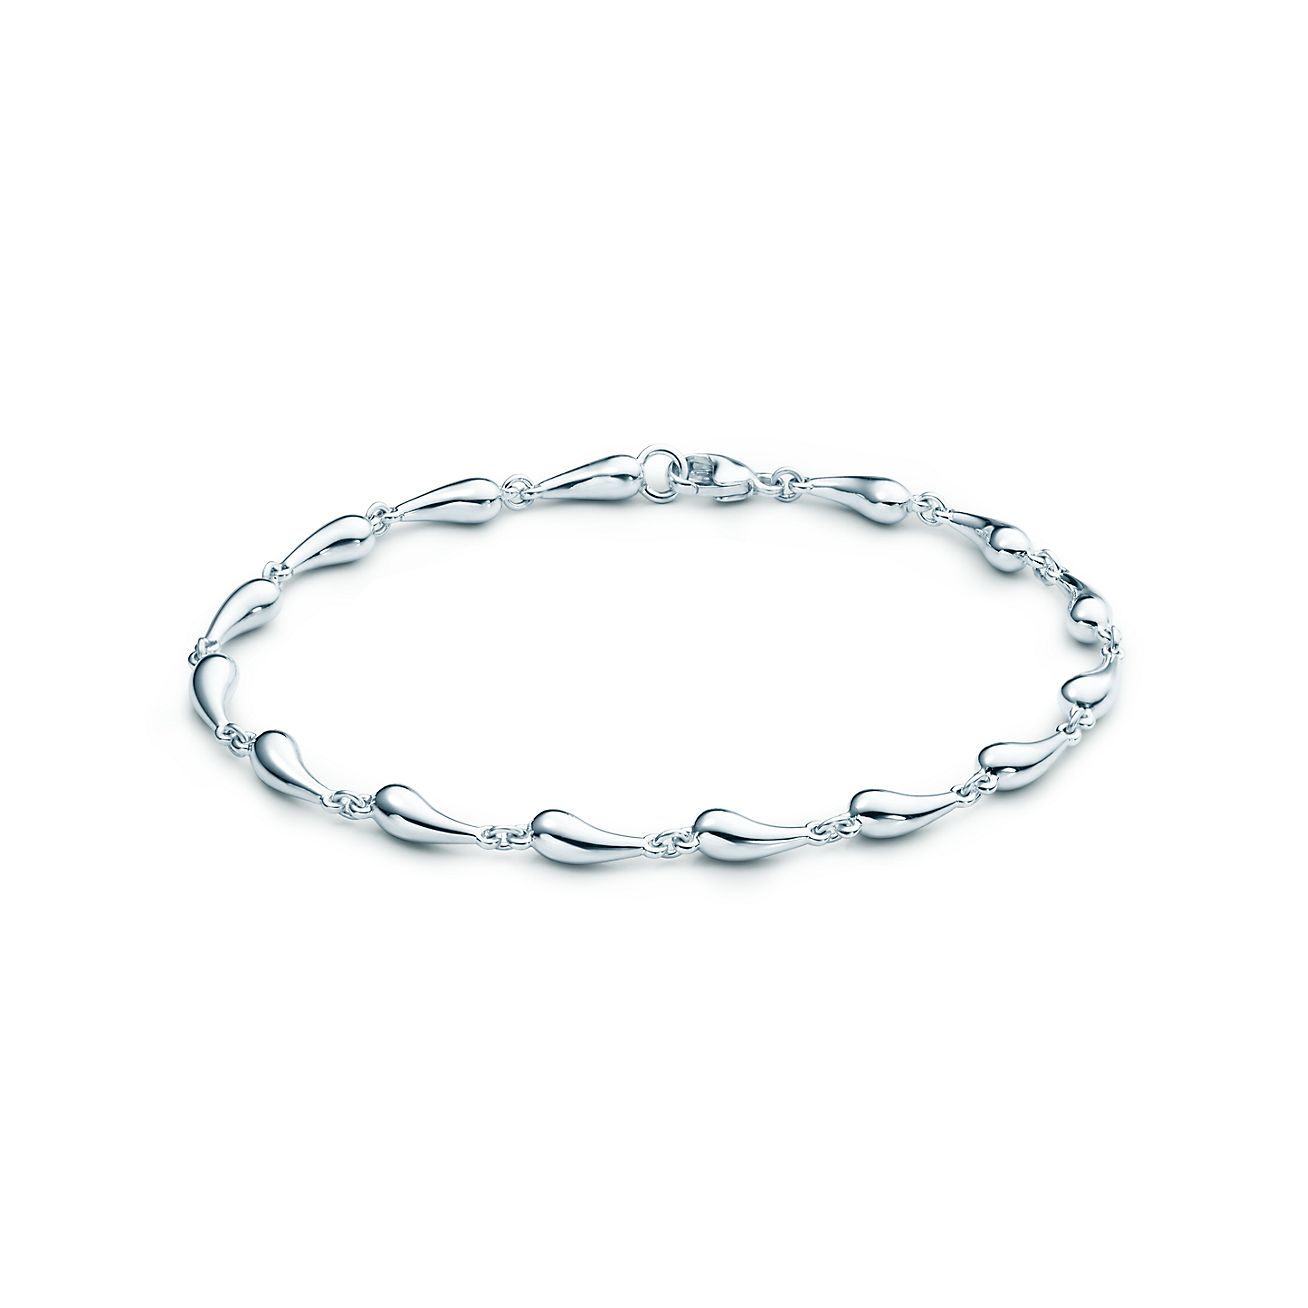 Elsa Peretti Teardrop Bracelet